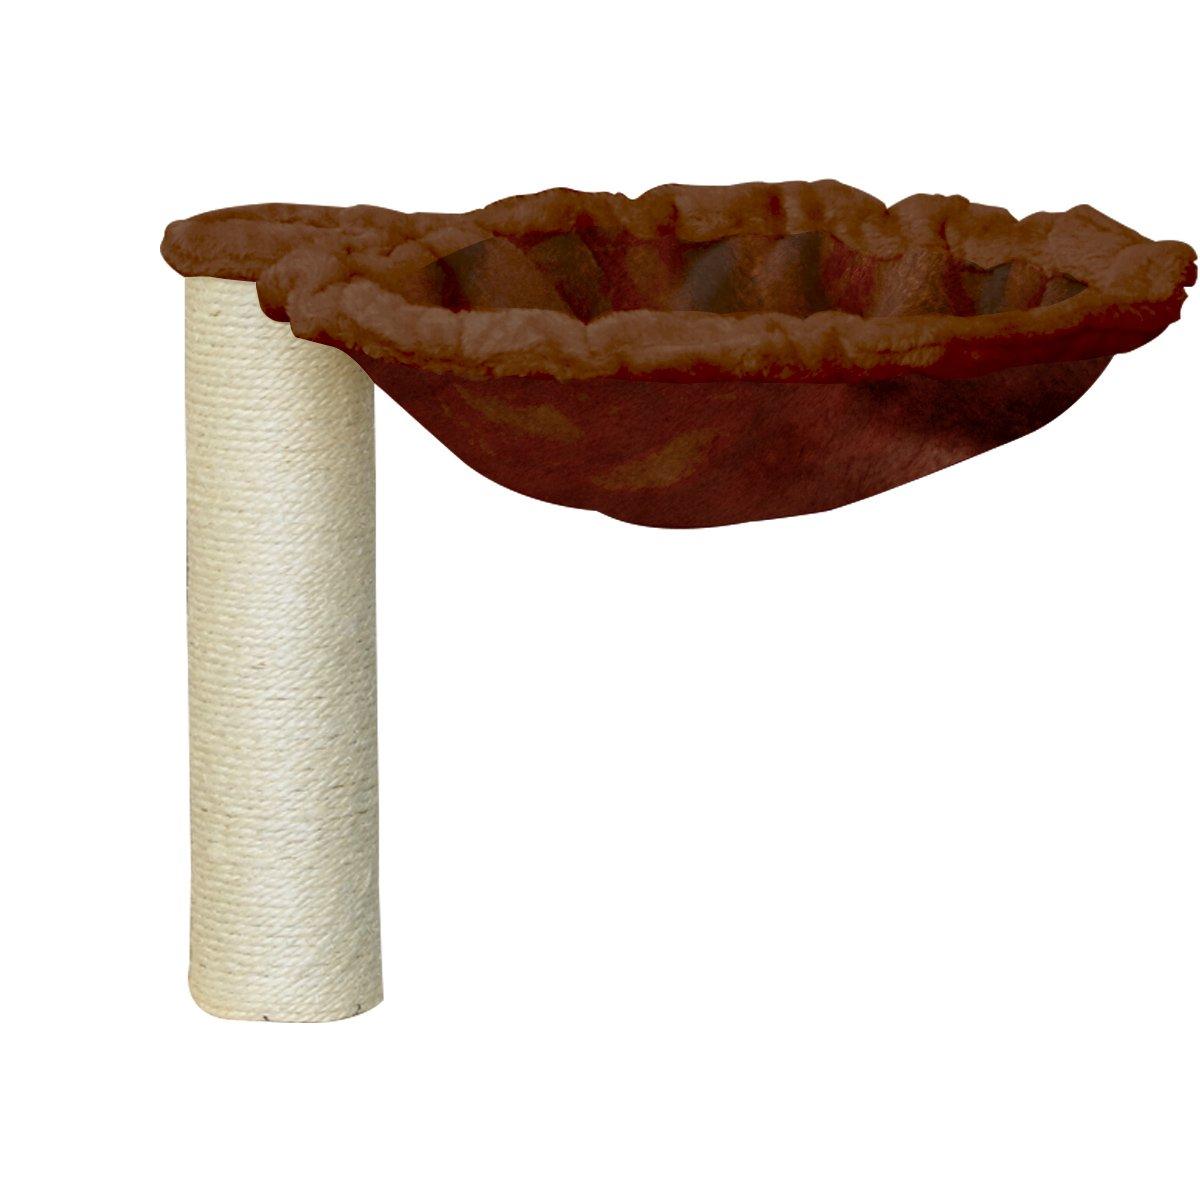 Ottostyle.jp cat tower   cat shelf for the post with hammock set 34cm (diameter 8cm) cord wound Brown  Cat Shelf  corresponding